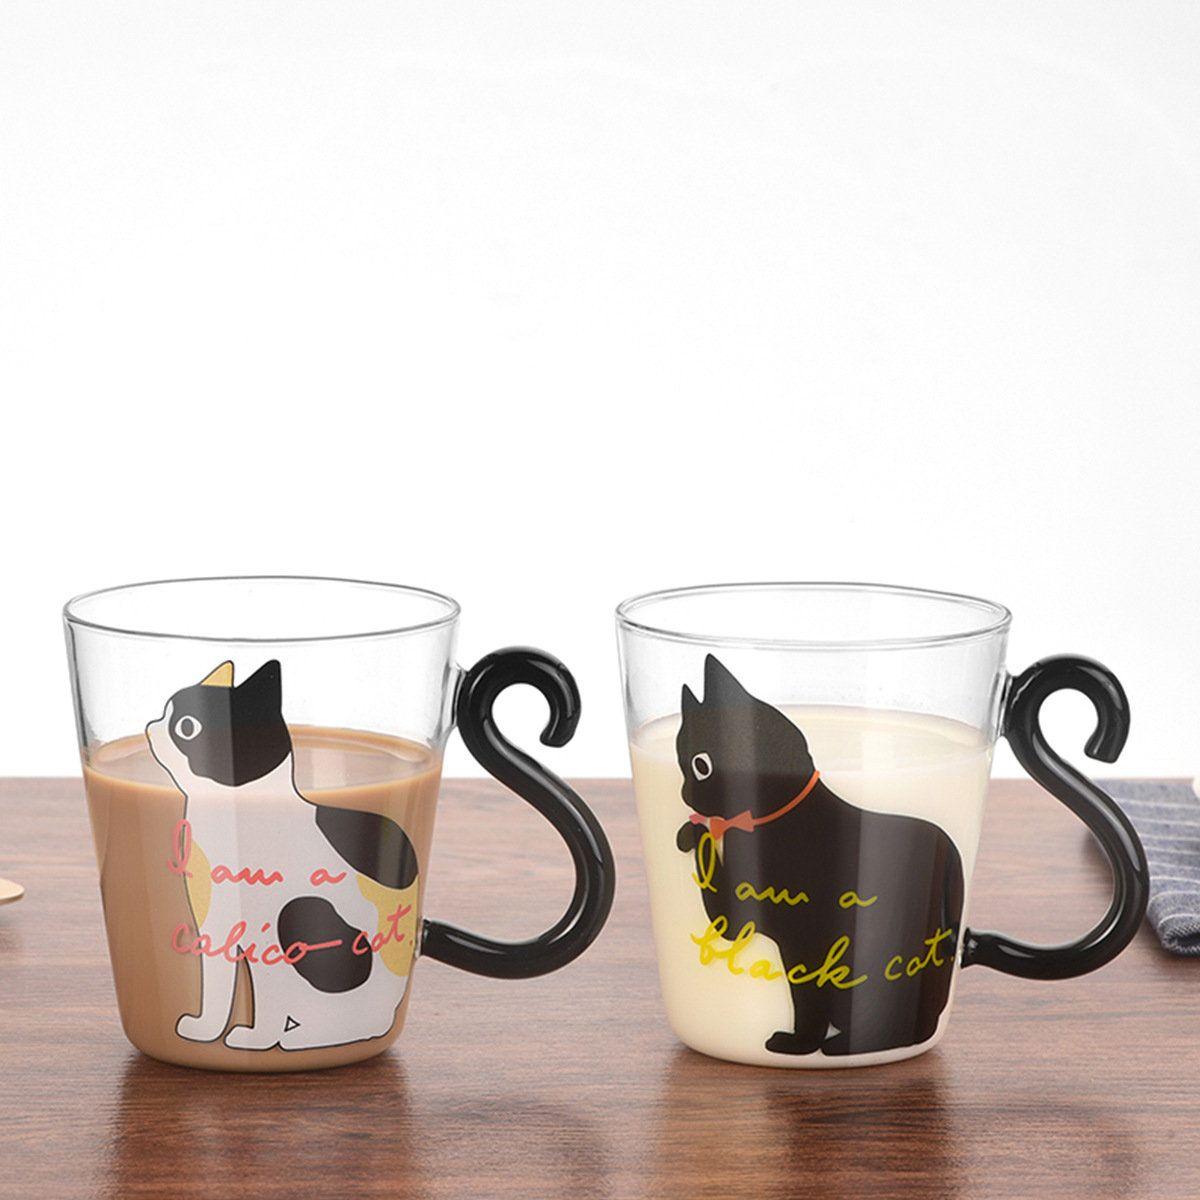 Discount Saiclehome Cat Glass Cartoon Children S Cup Creative Handle Coffee Cup Single Layer Transparent Juice Drink Cup Cat Coffee Mug Mugs Cat Coffee